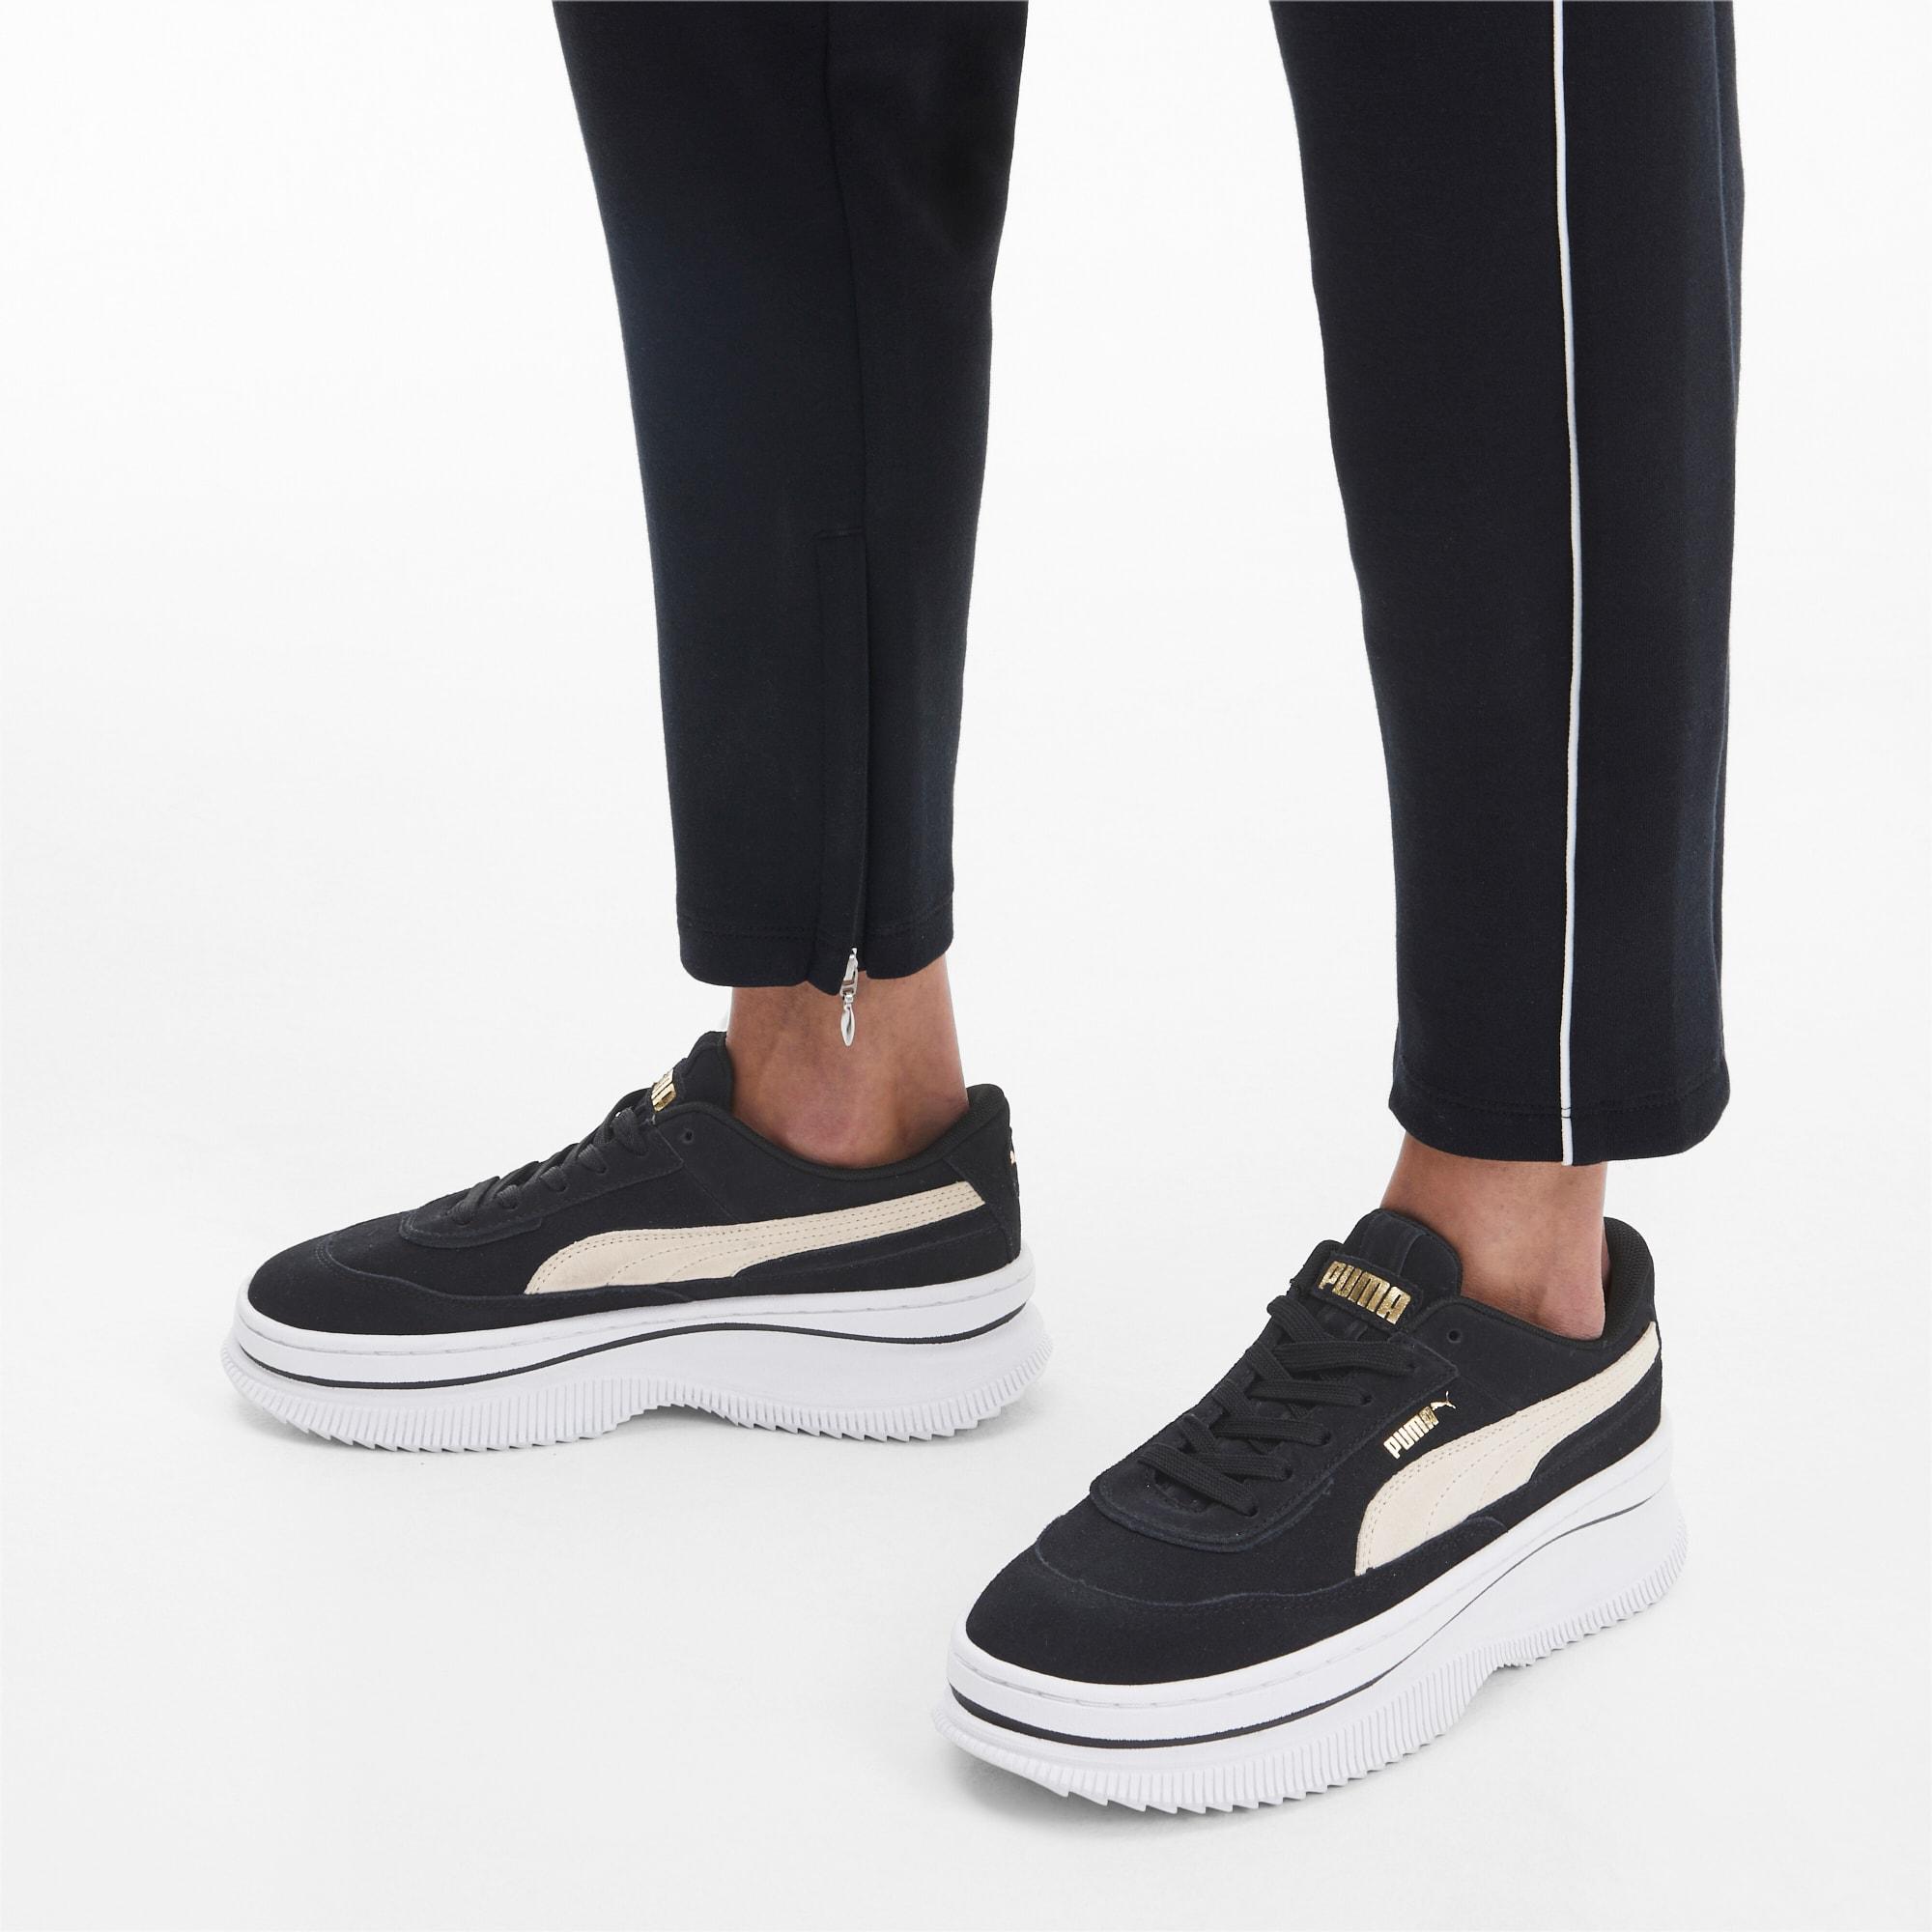 Puma Schuhe Deva Suede W Marshmallow Black 40,0 | GALERIA